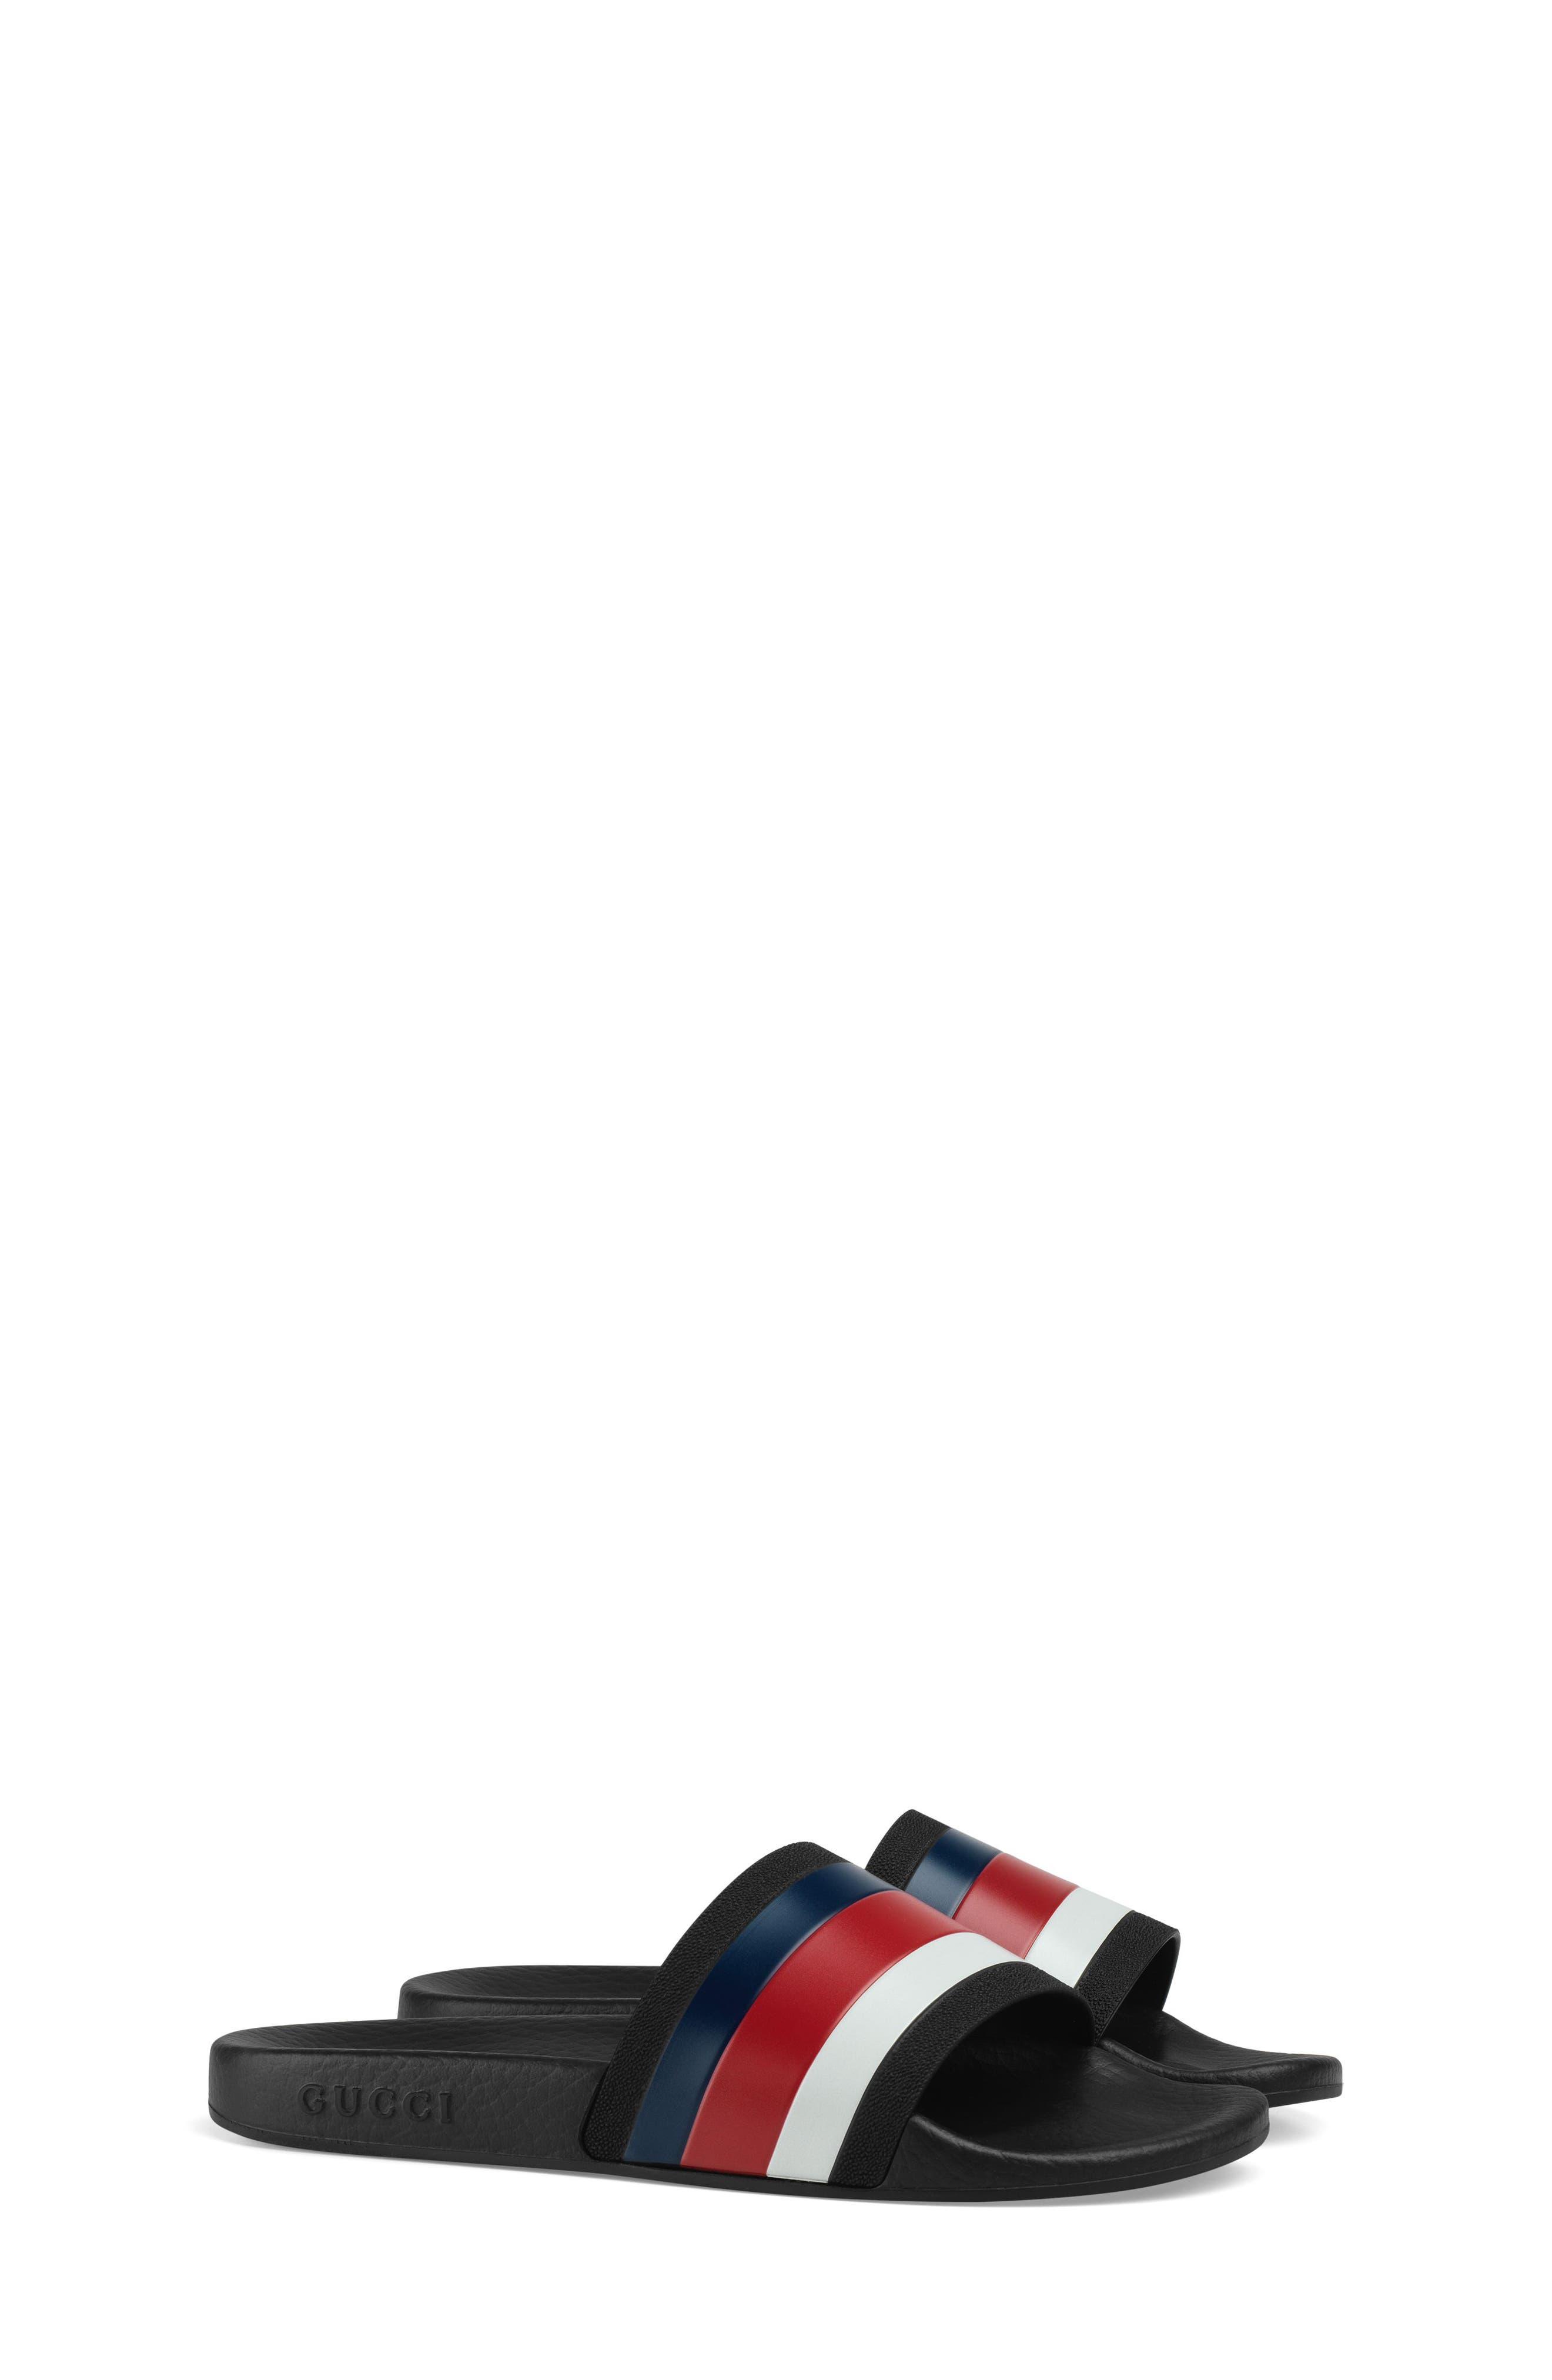 Pursuit Slide Sandal,                         Main,                         color, Red/ White/ Blue